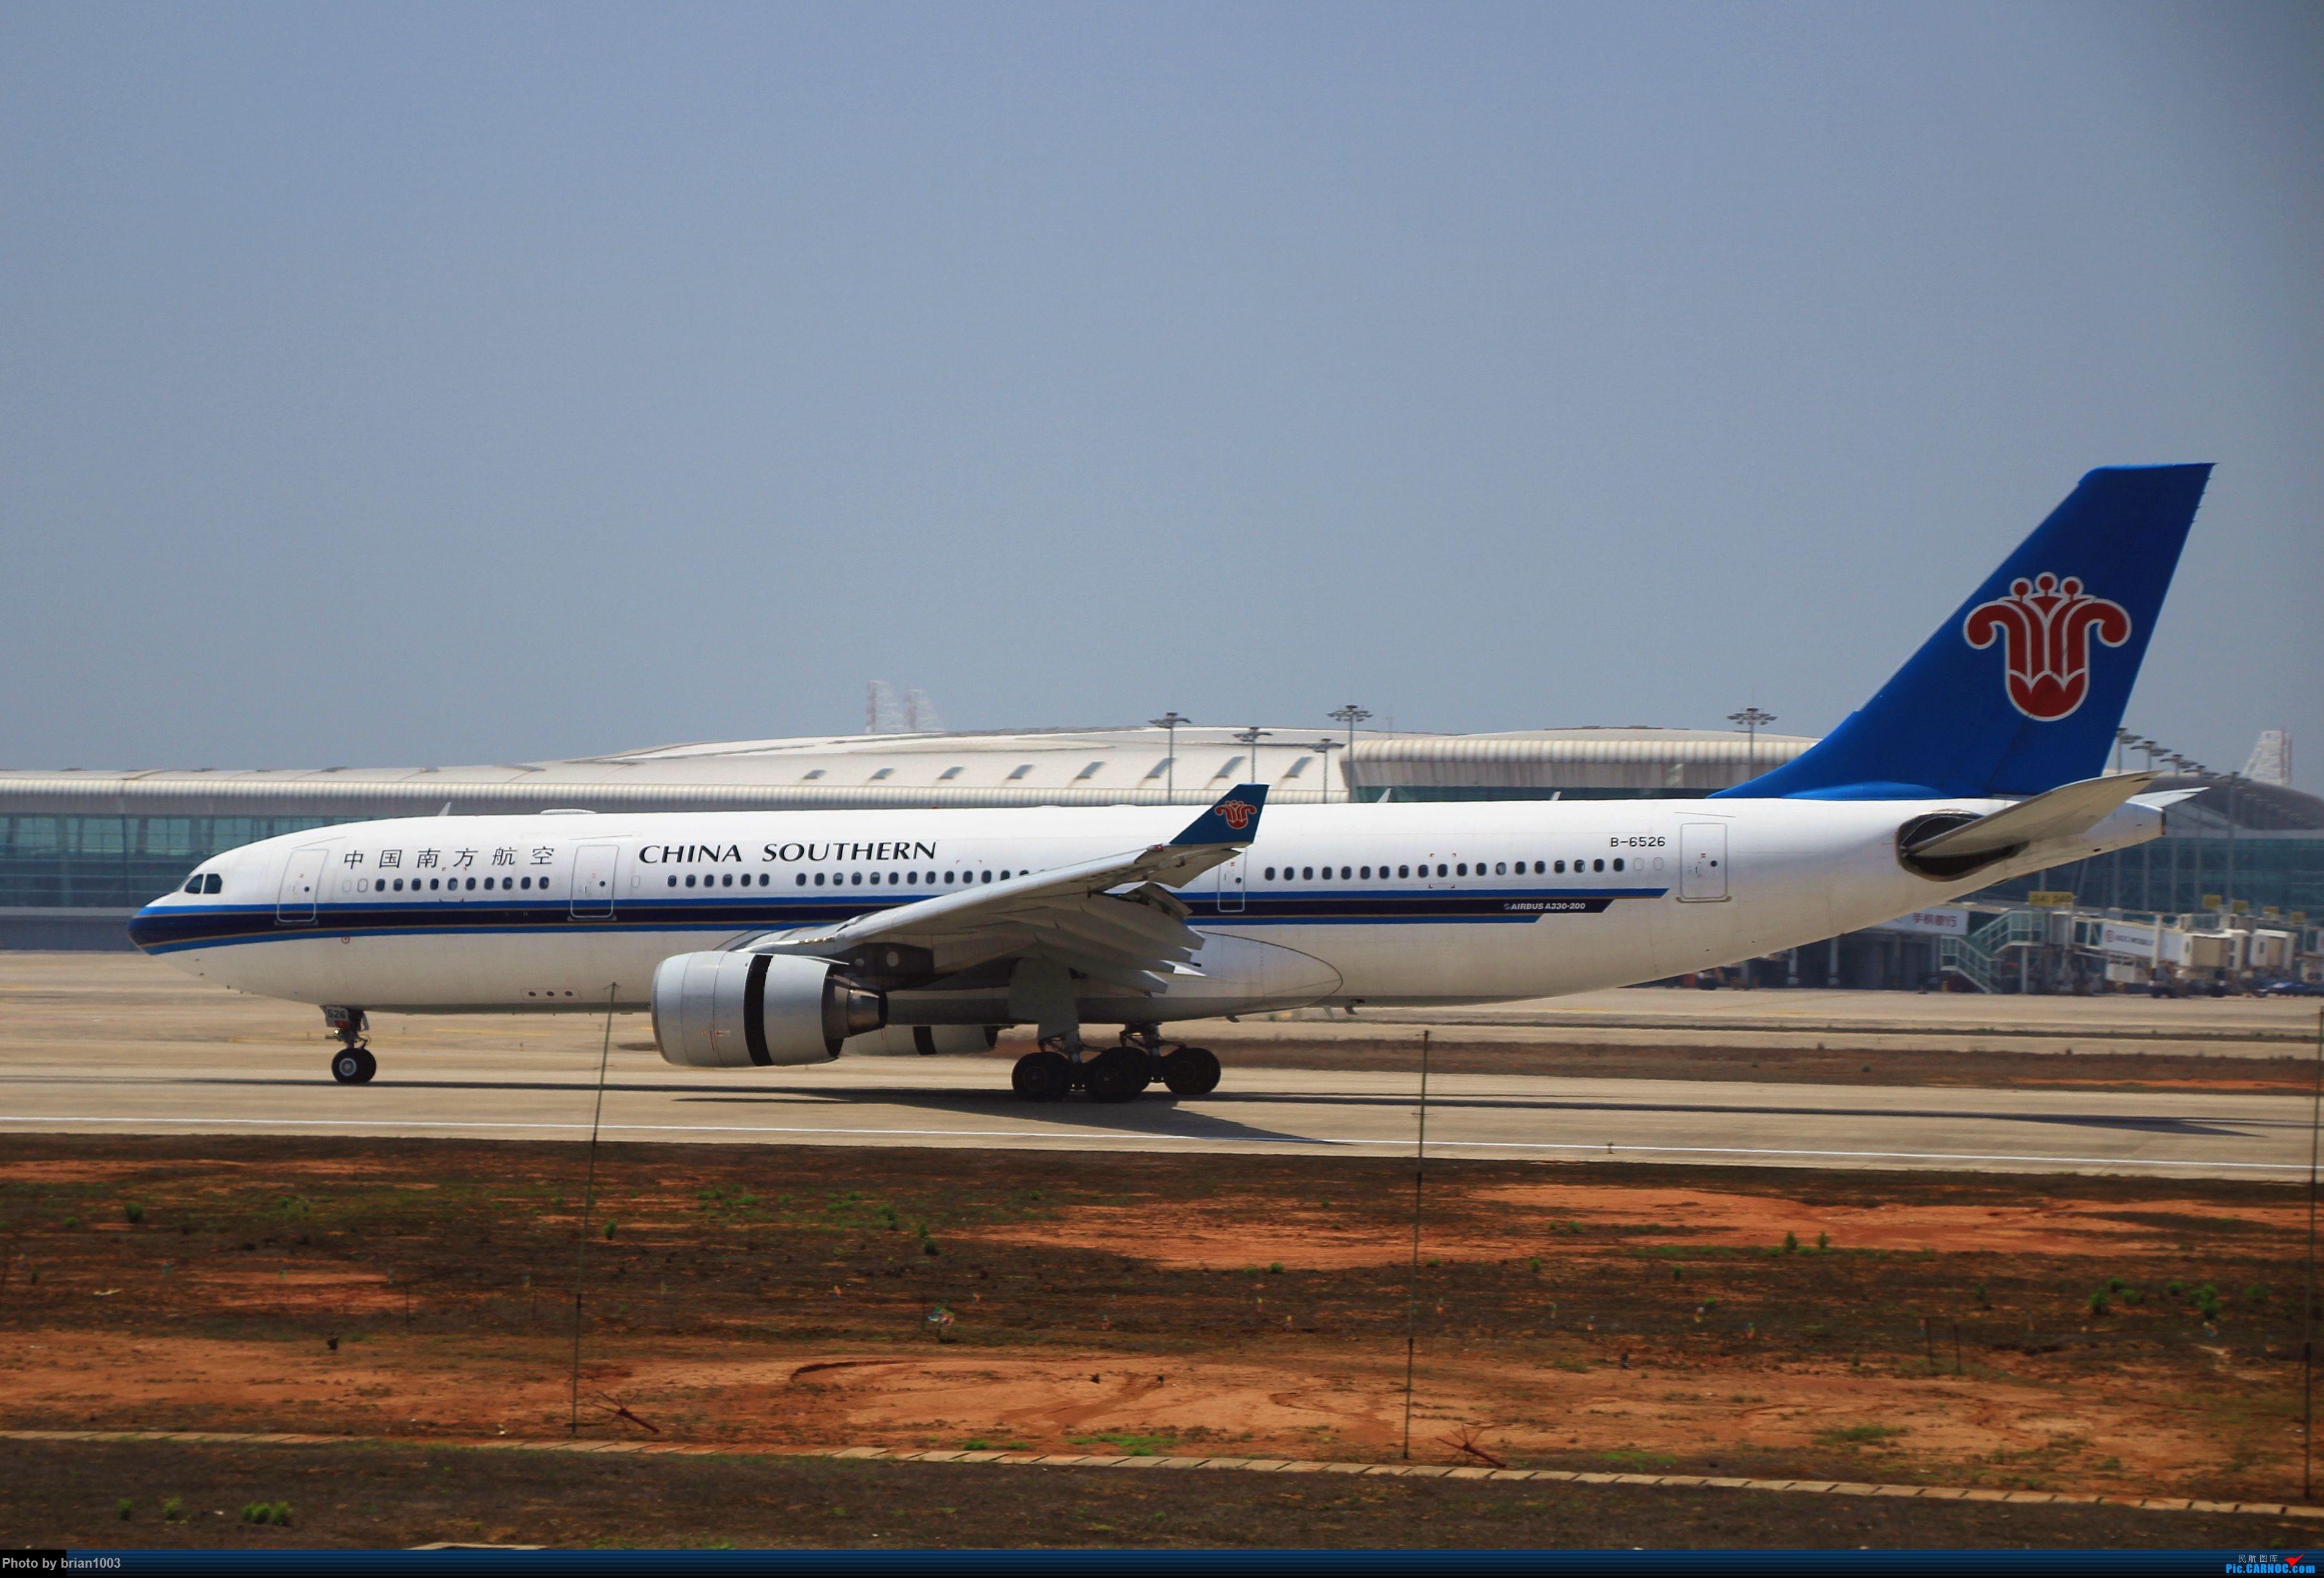 Re:[原创]WUH武汉天河机场拍机之喜迎酷航788和偶遇某其他飞机 AIRBUS A330-200 B-6526